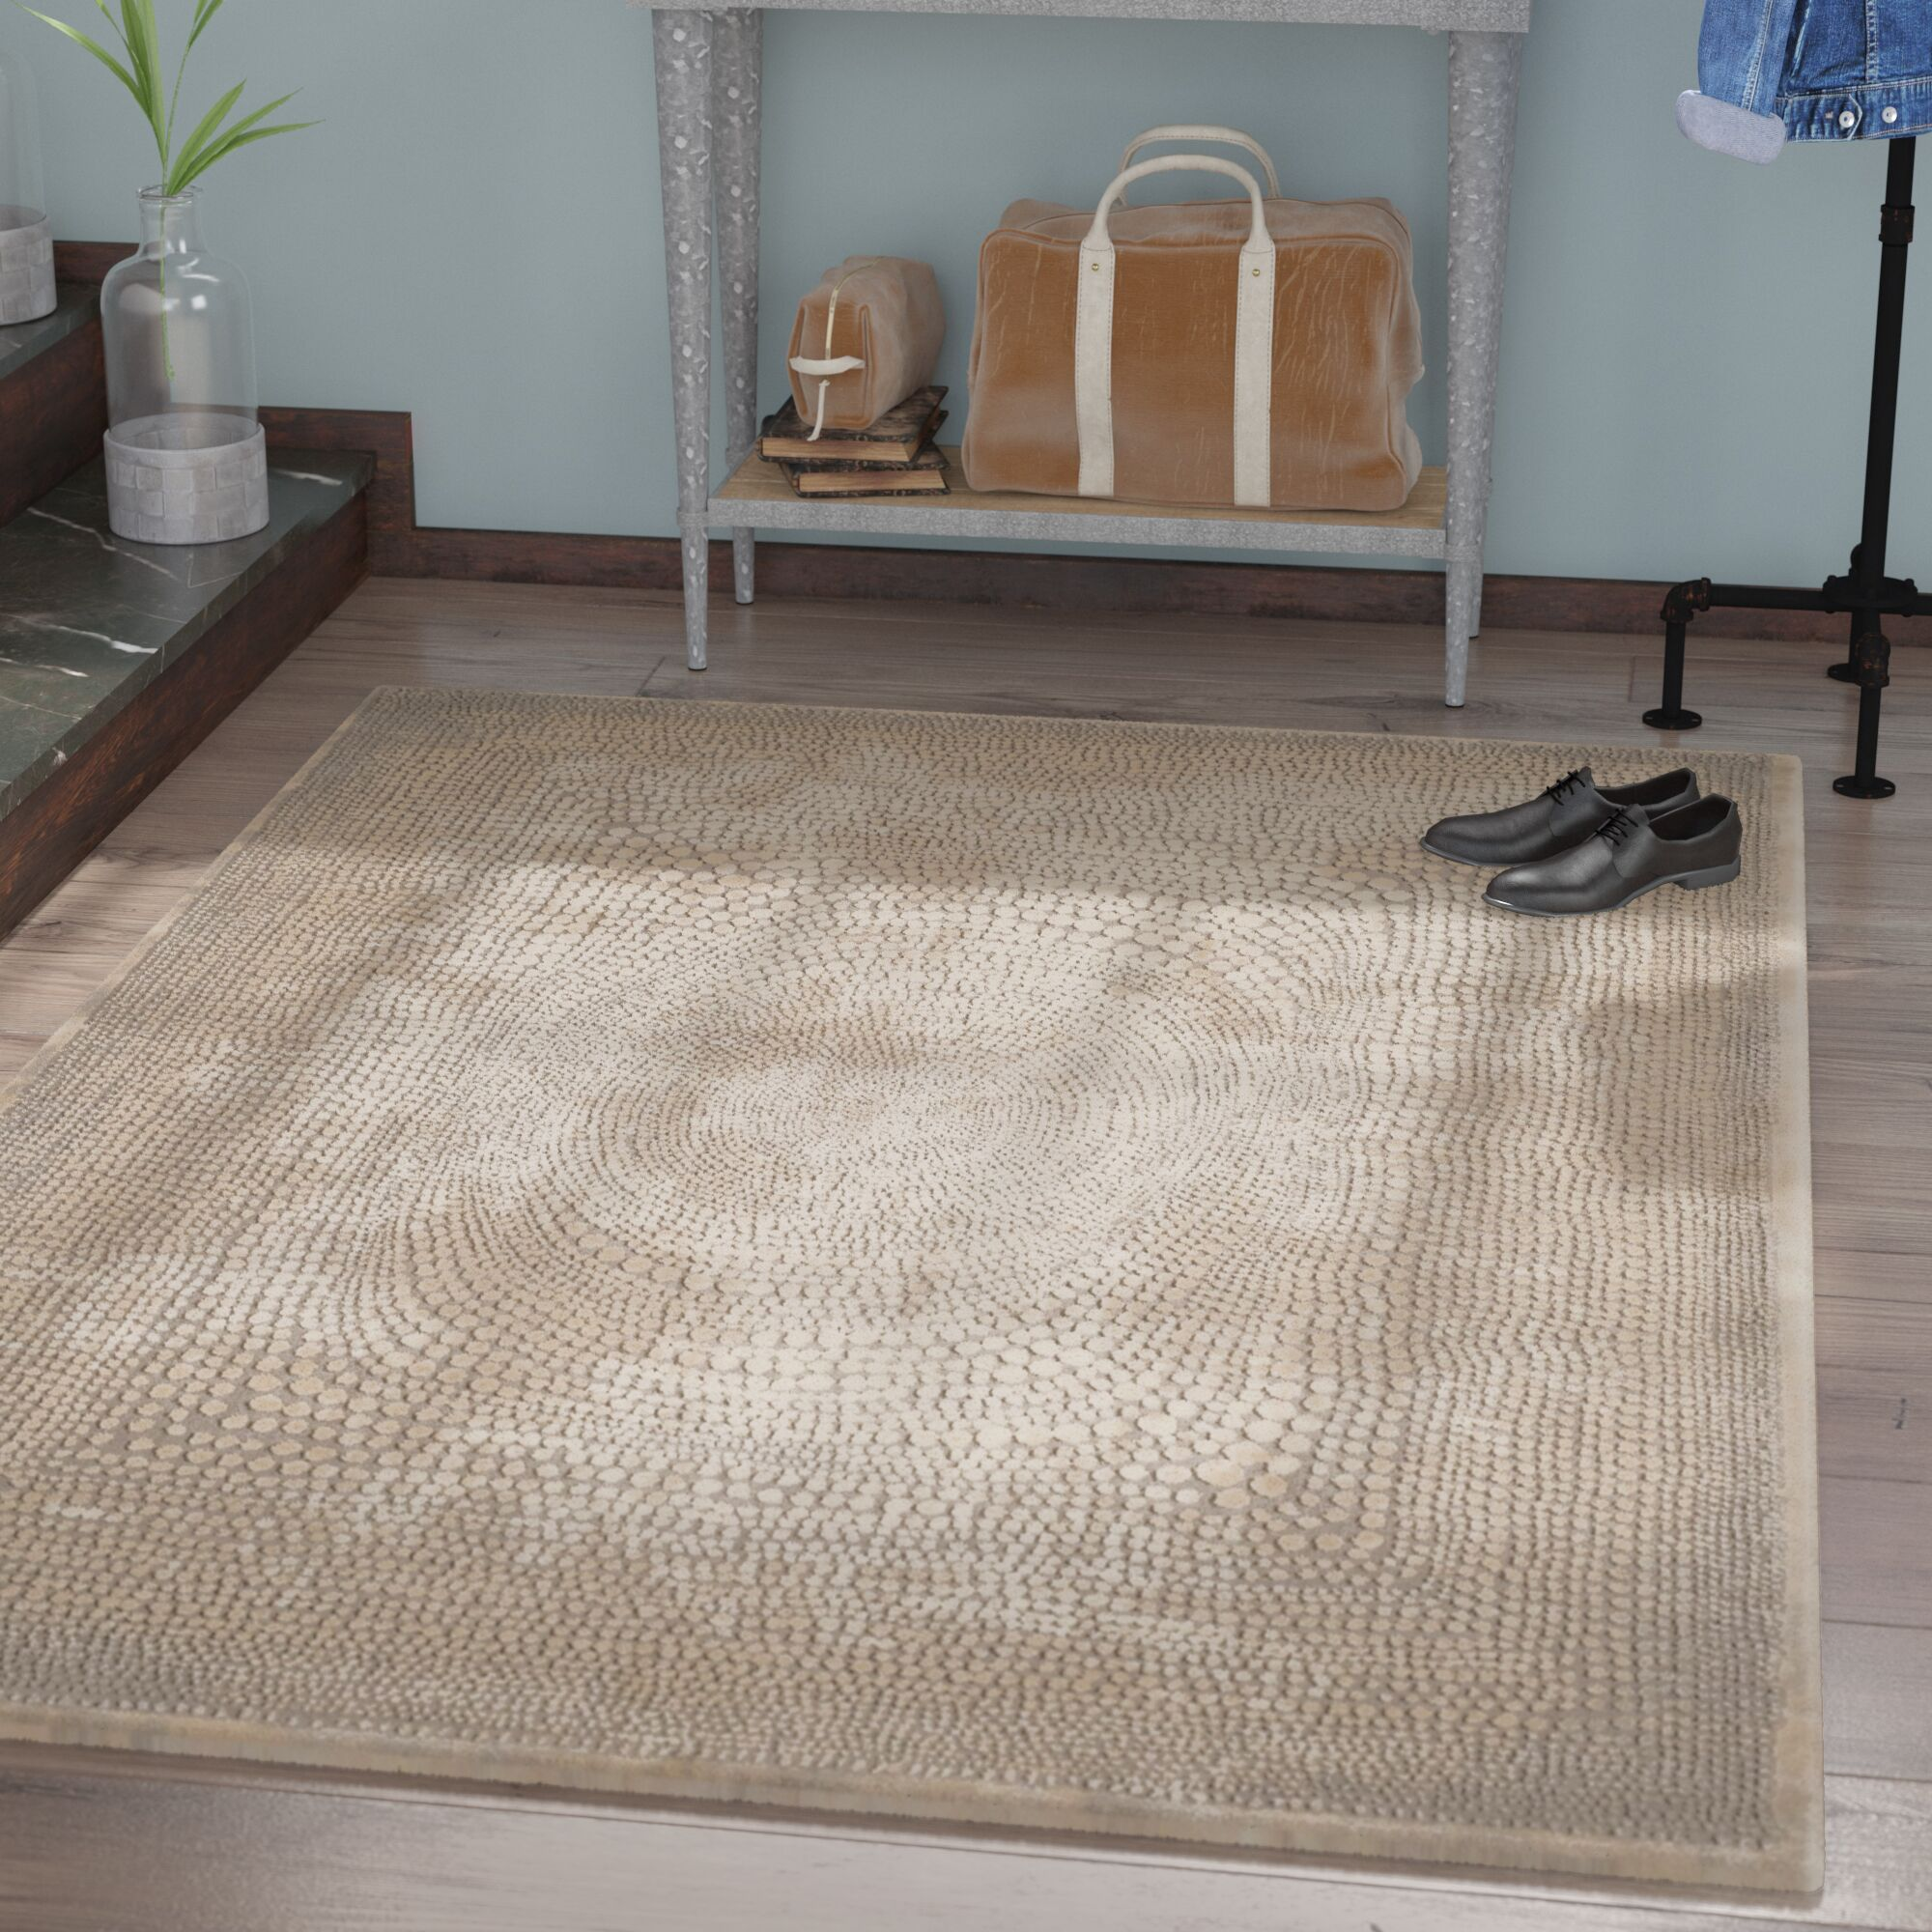 Wendi Ivory/Gray Area Rug Rug Size: Rectangle 9' x 12'